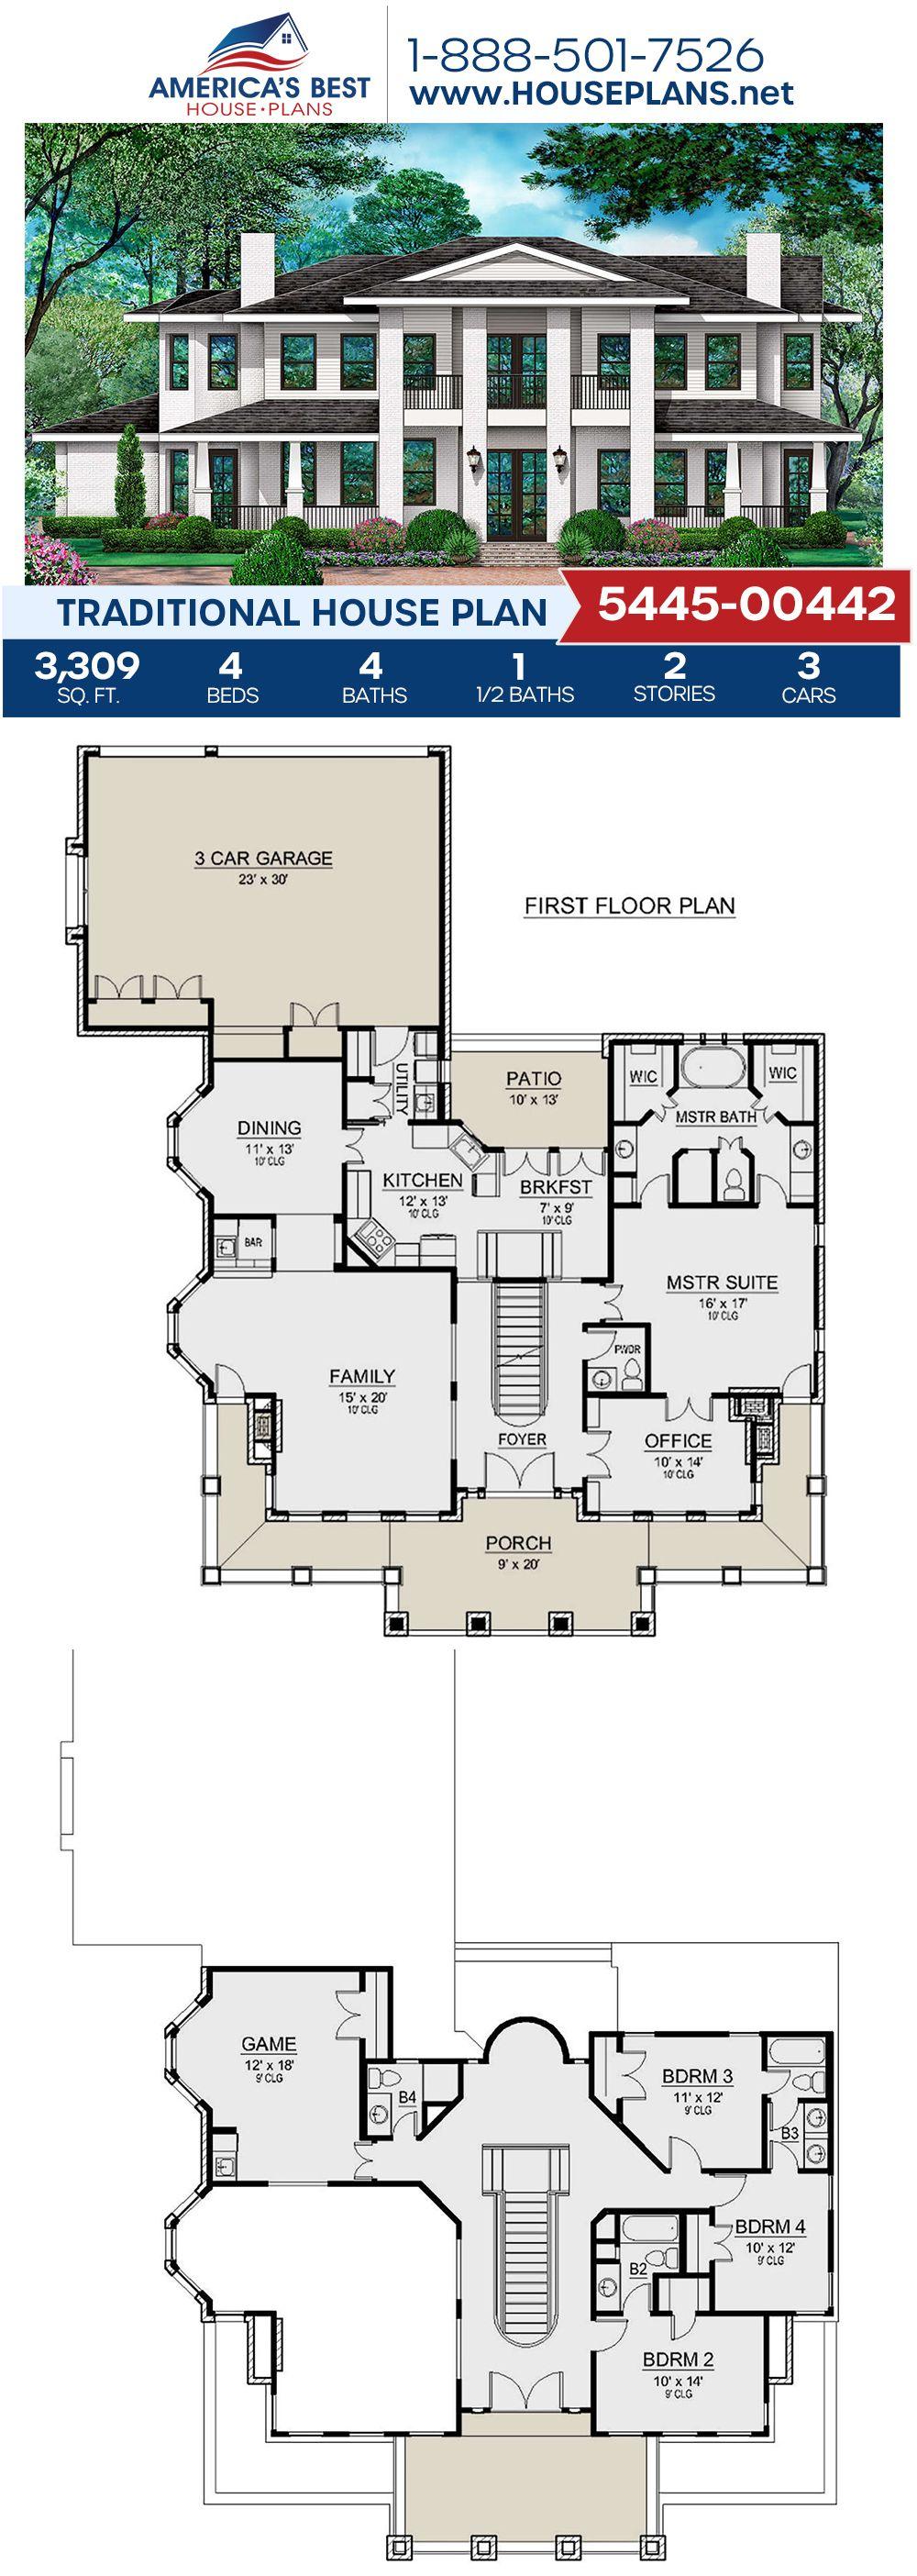 House Plan 5445 00442 Traditional Plan 3 309 Square Feet 4 Bedrooms 4 5 Bathrooms Traditional House House Plans Traditional House Plan